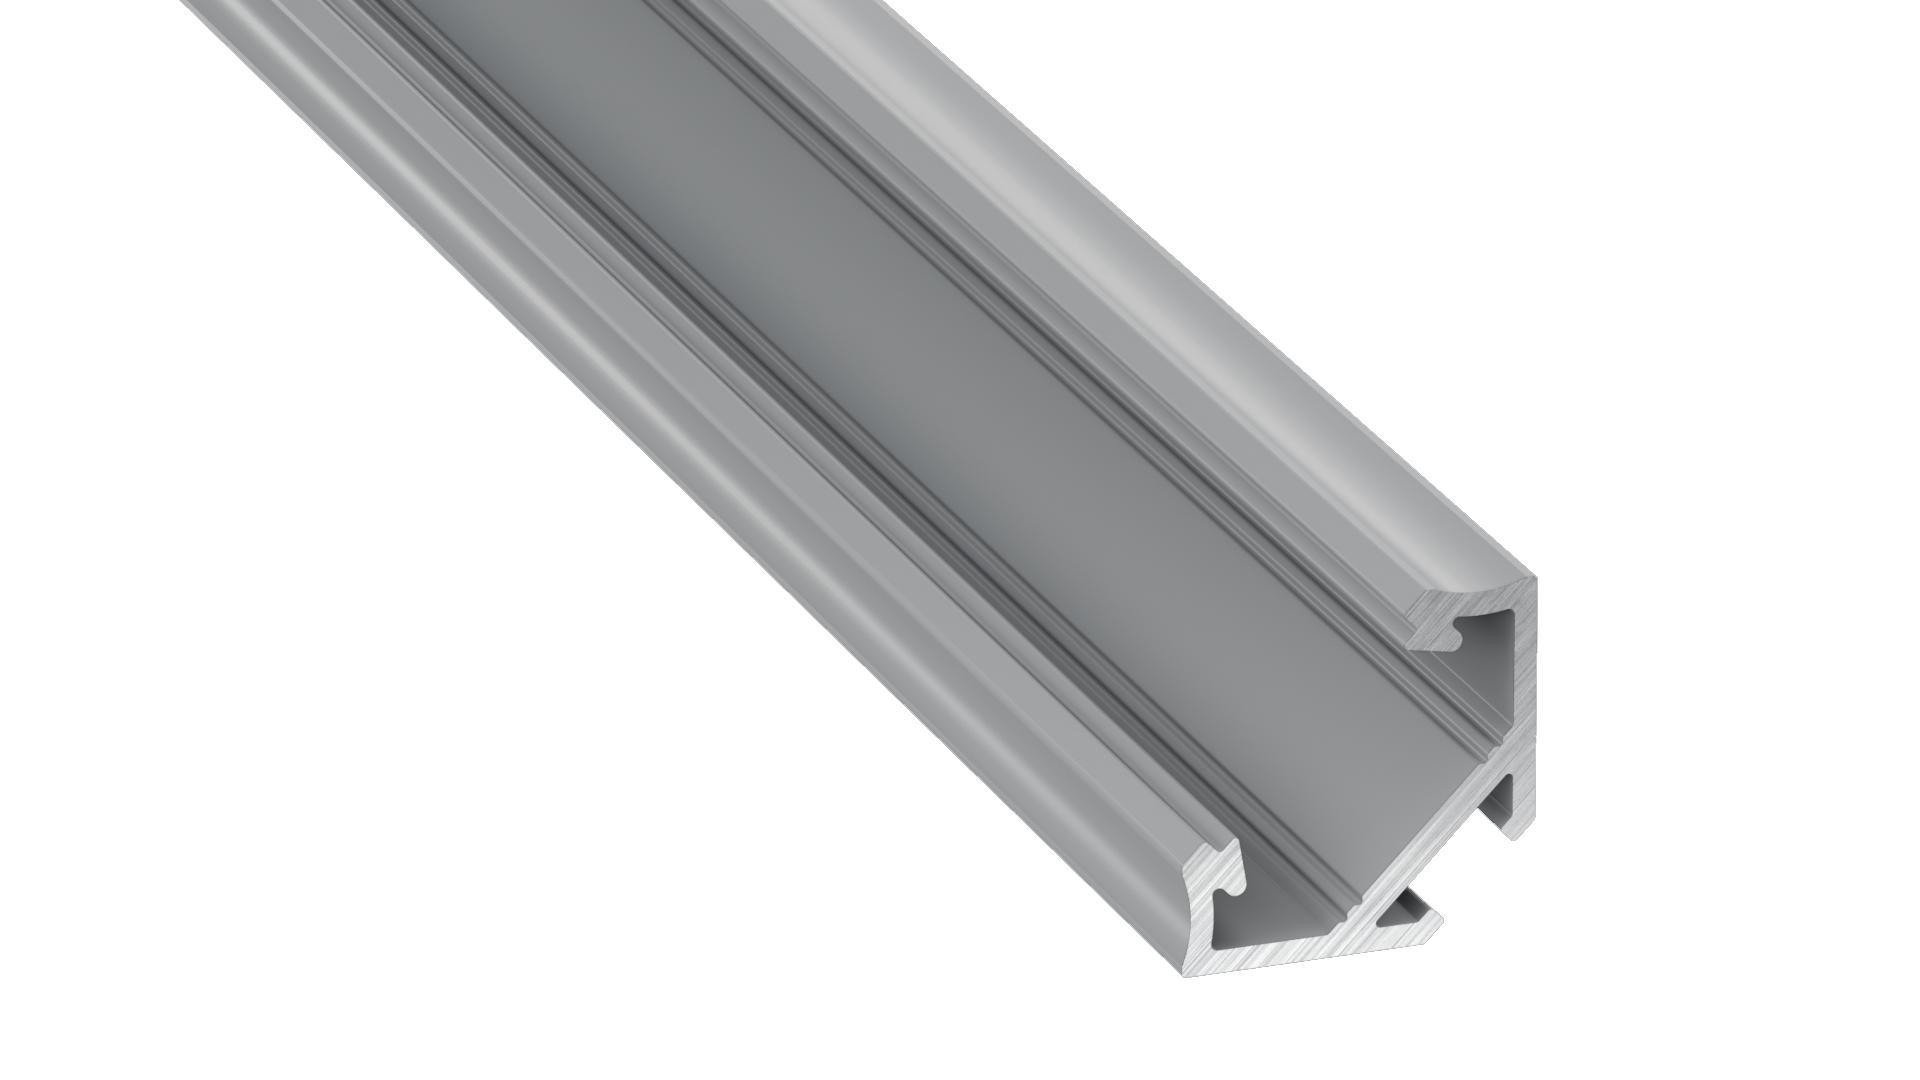 Profil Aluminiowy Srebrny Typ C 2m + Klosz Mleczny (C Sreb 2 M)